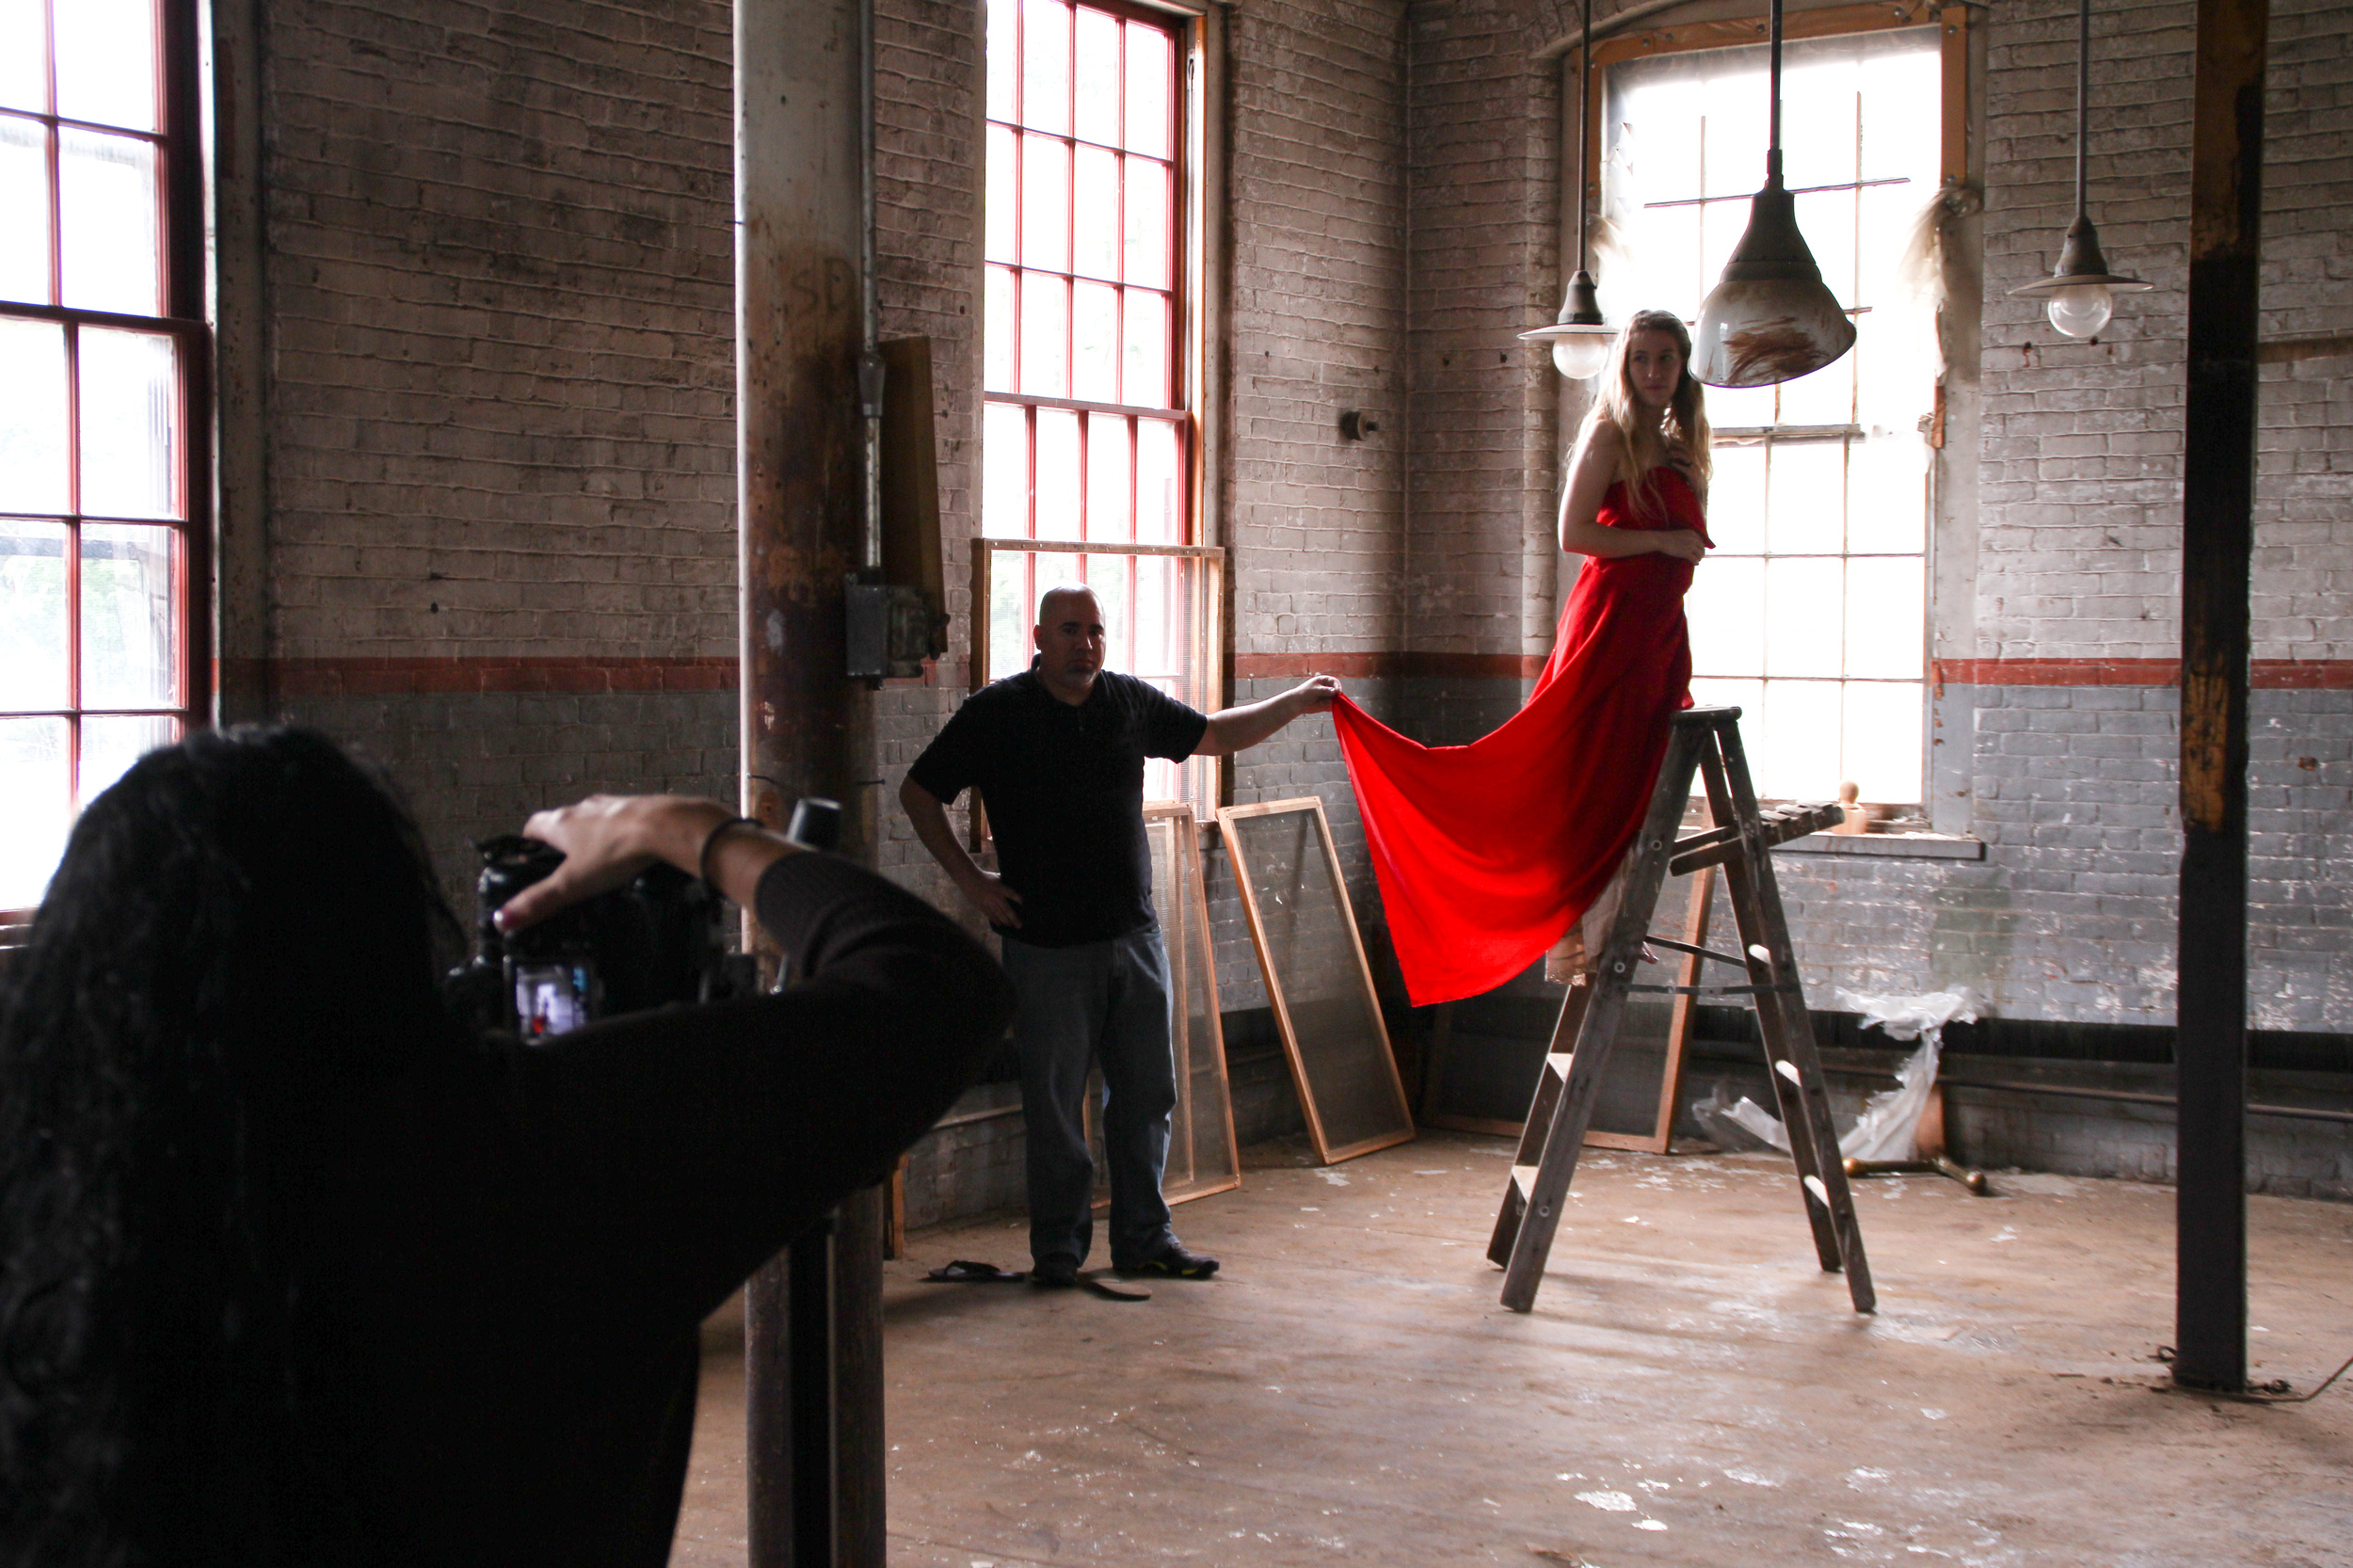 Brooke Shaden workshop at my 2nd studio -BSP West